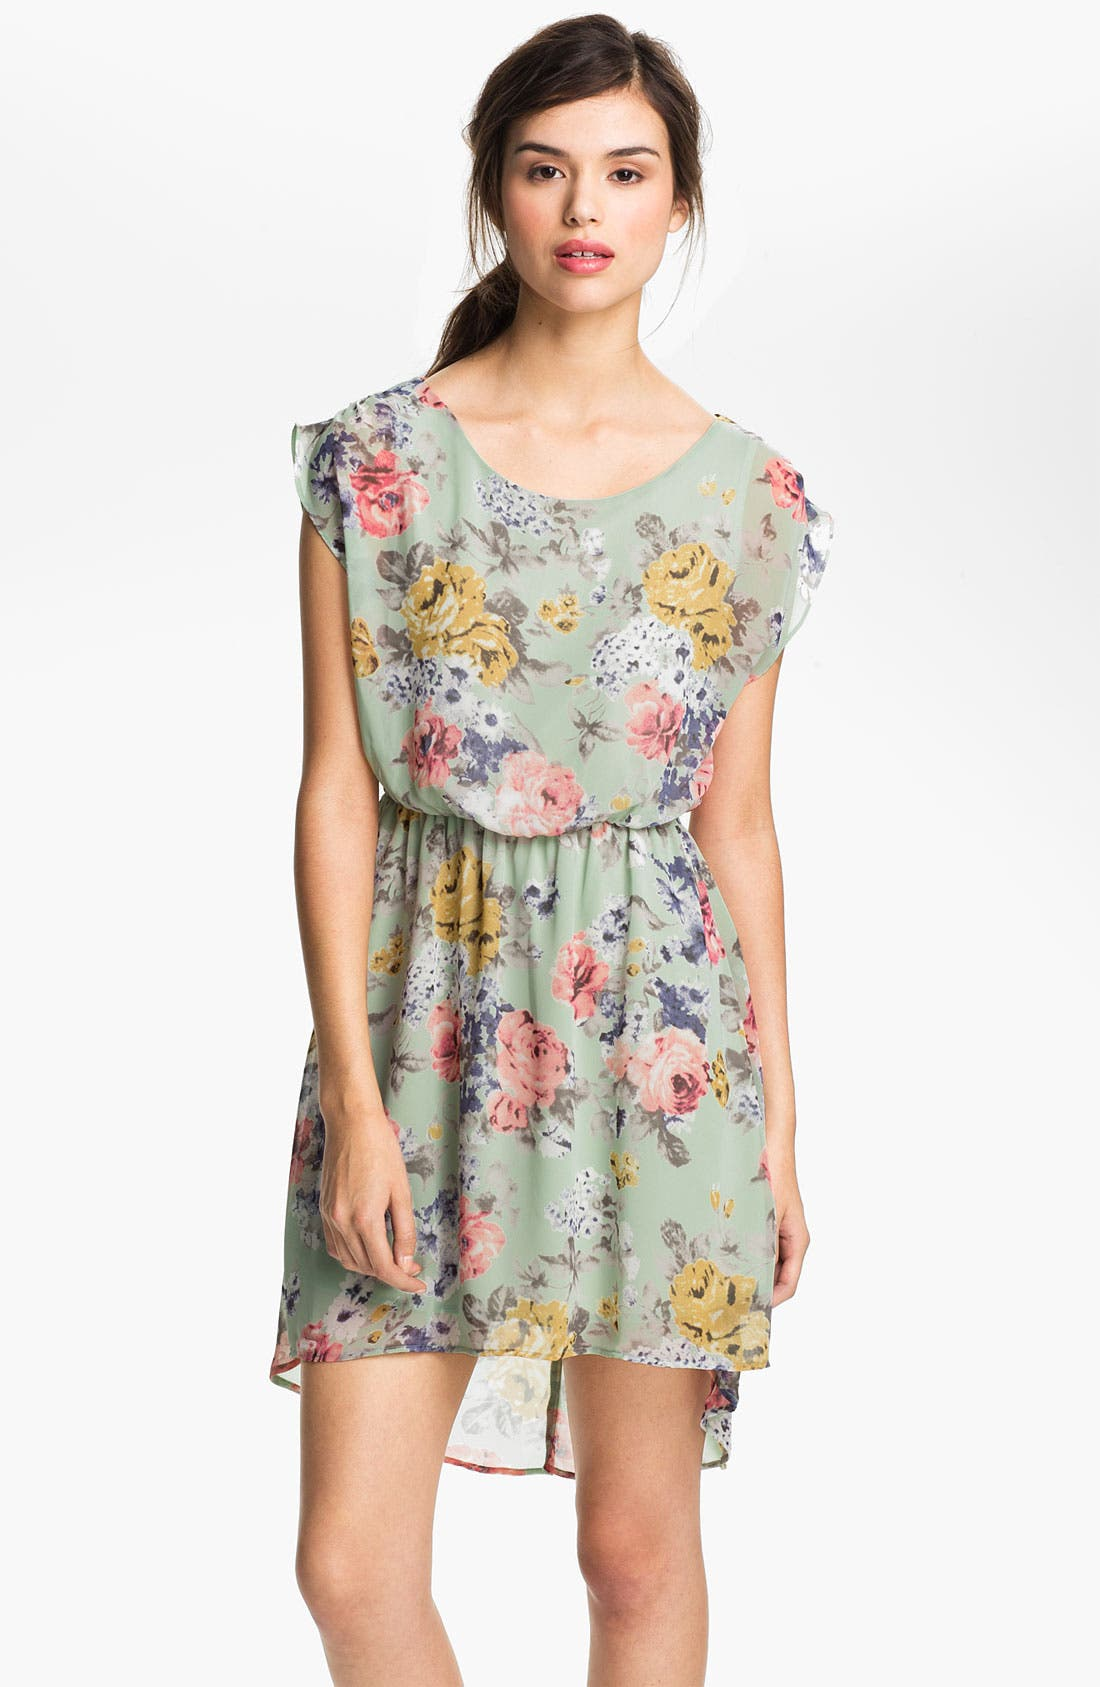 Alternate Image 1 Selected - Lush 'Dakota' Chiffon Dress (Juniors)